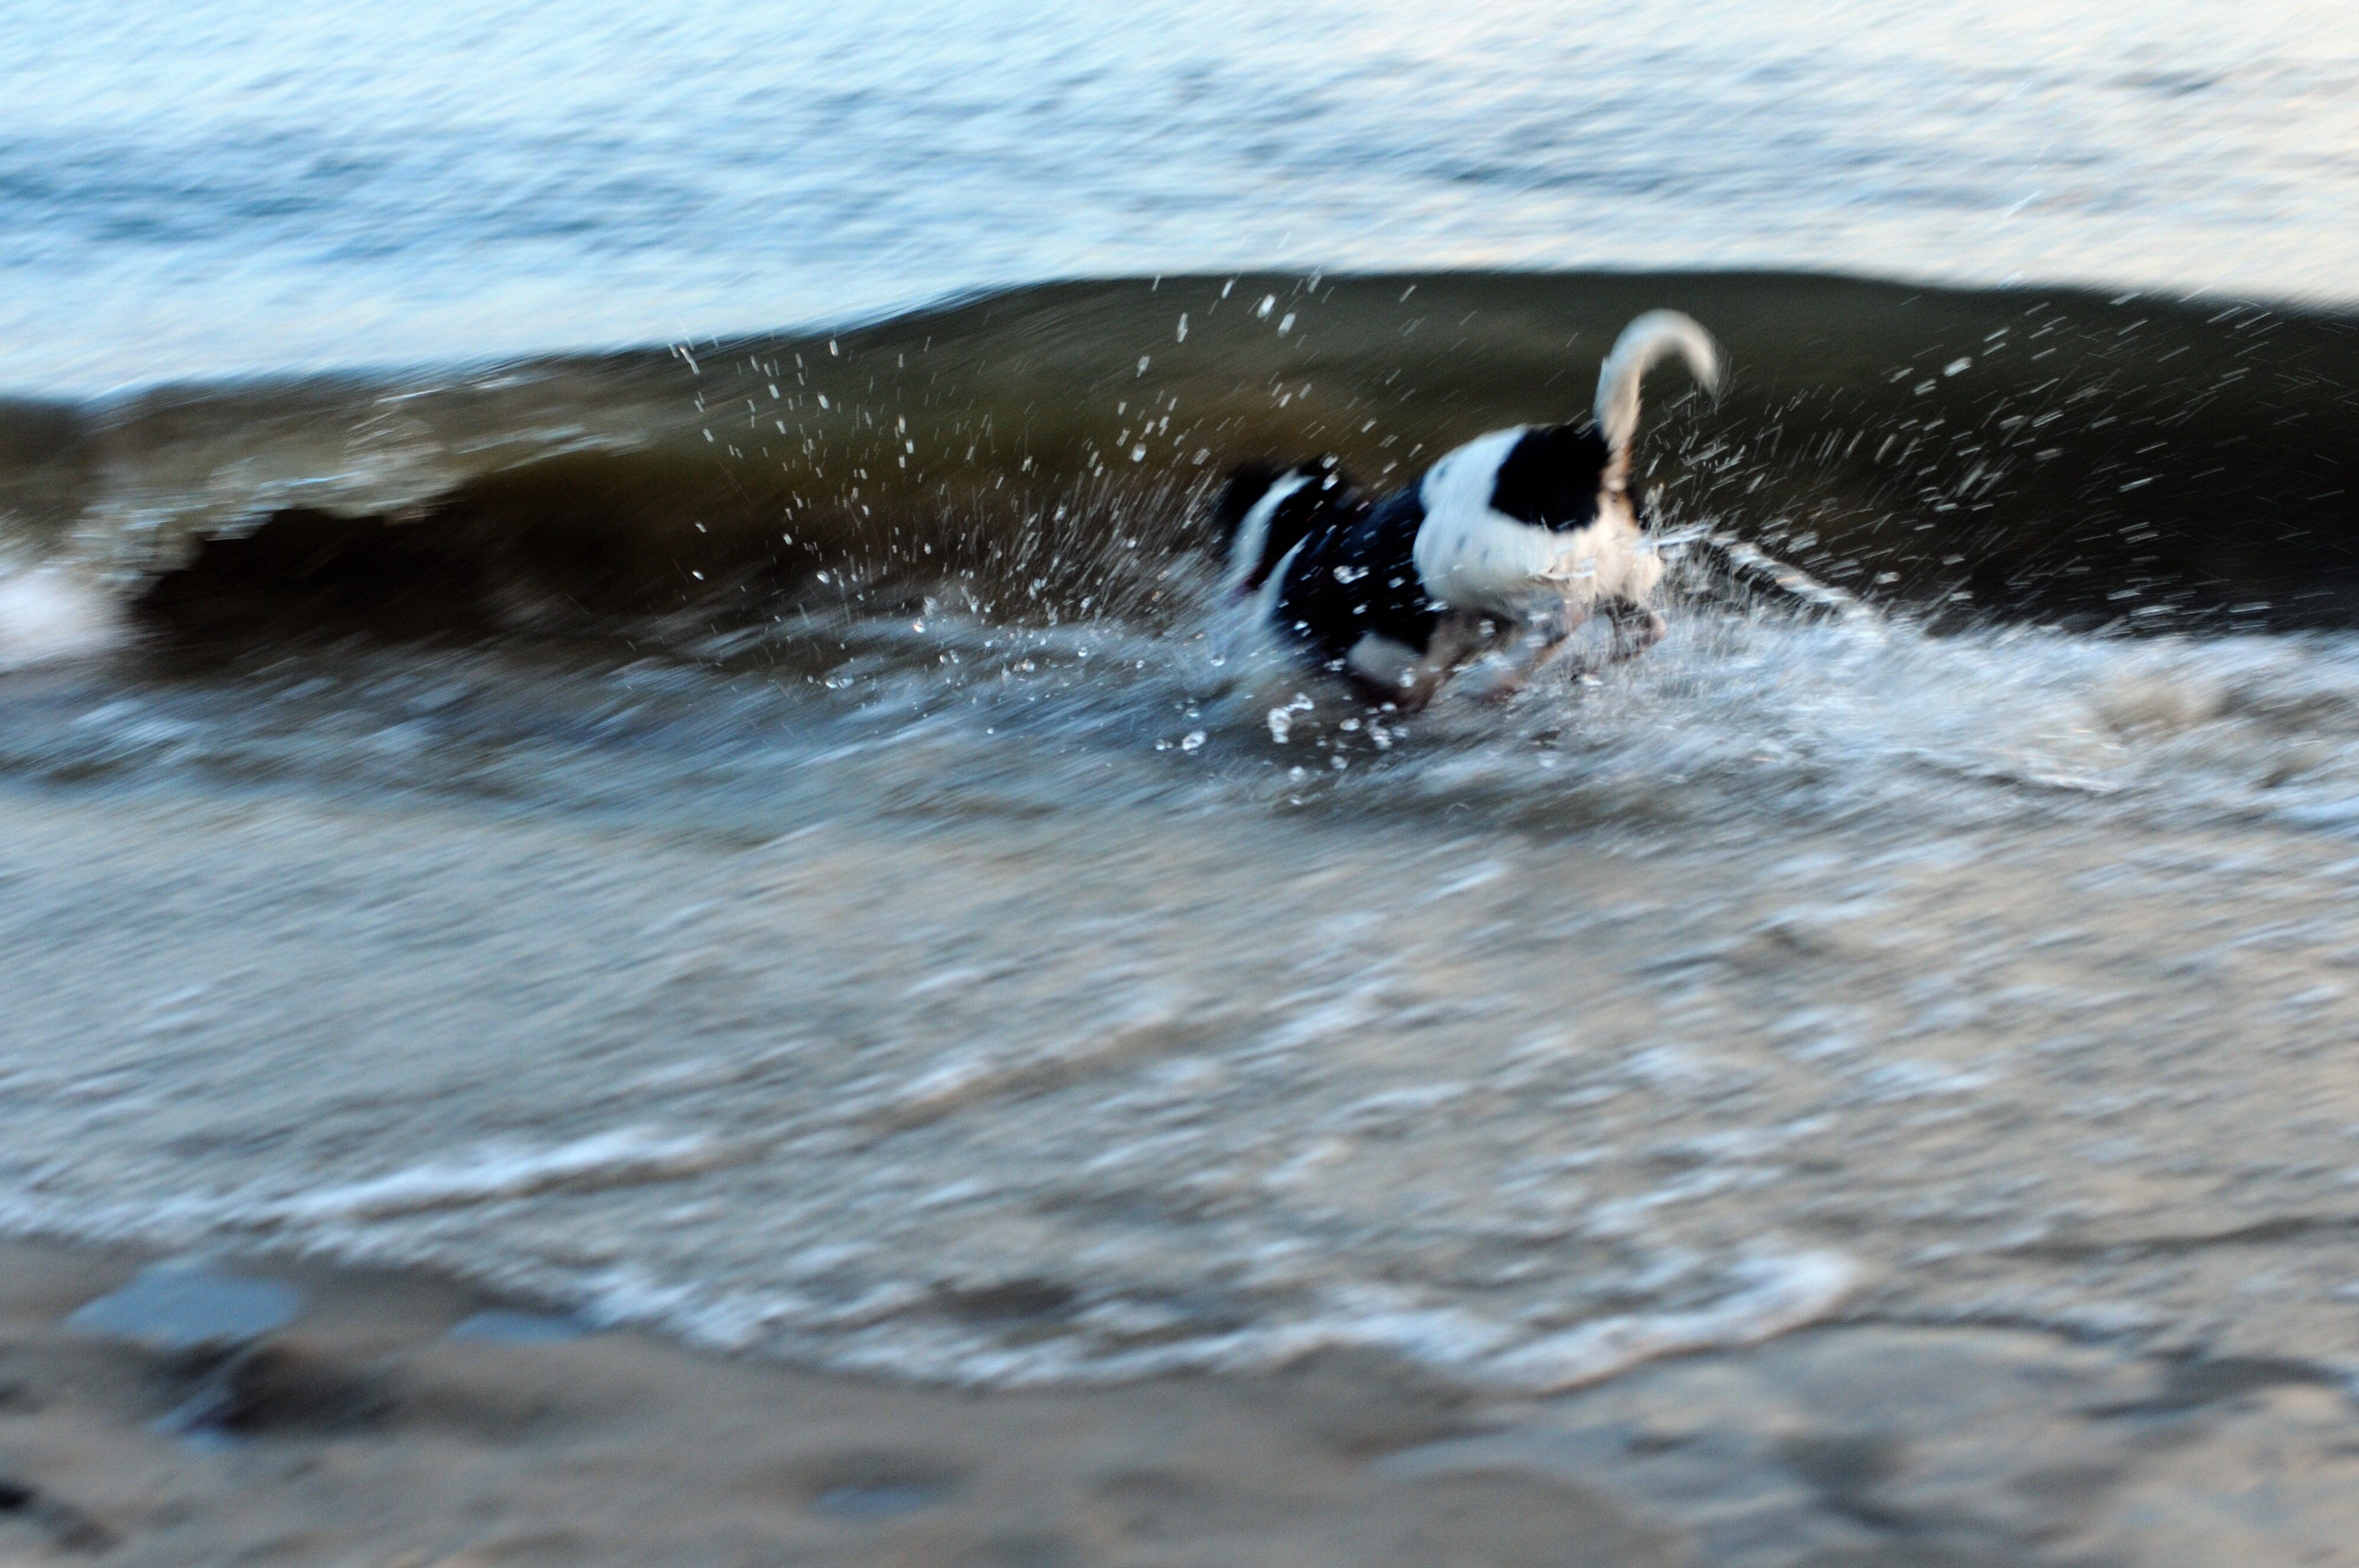 Hund in wellen